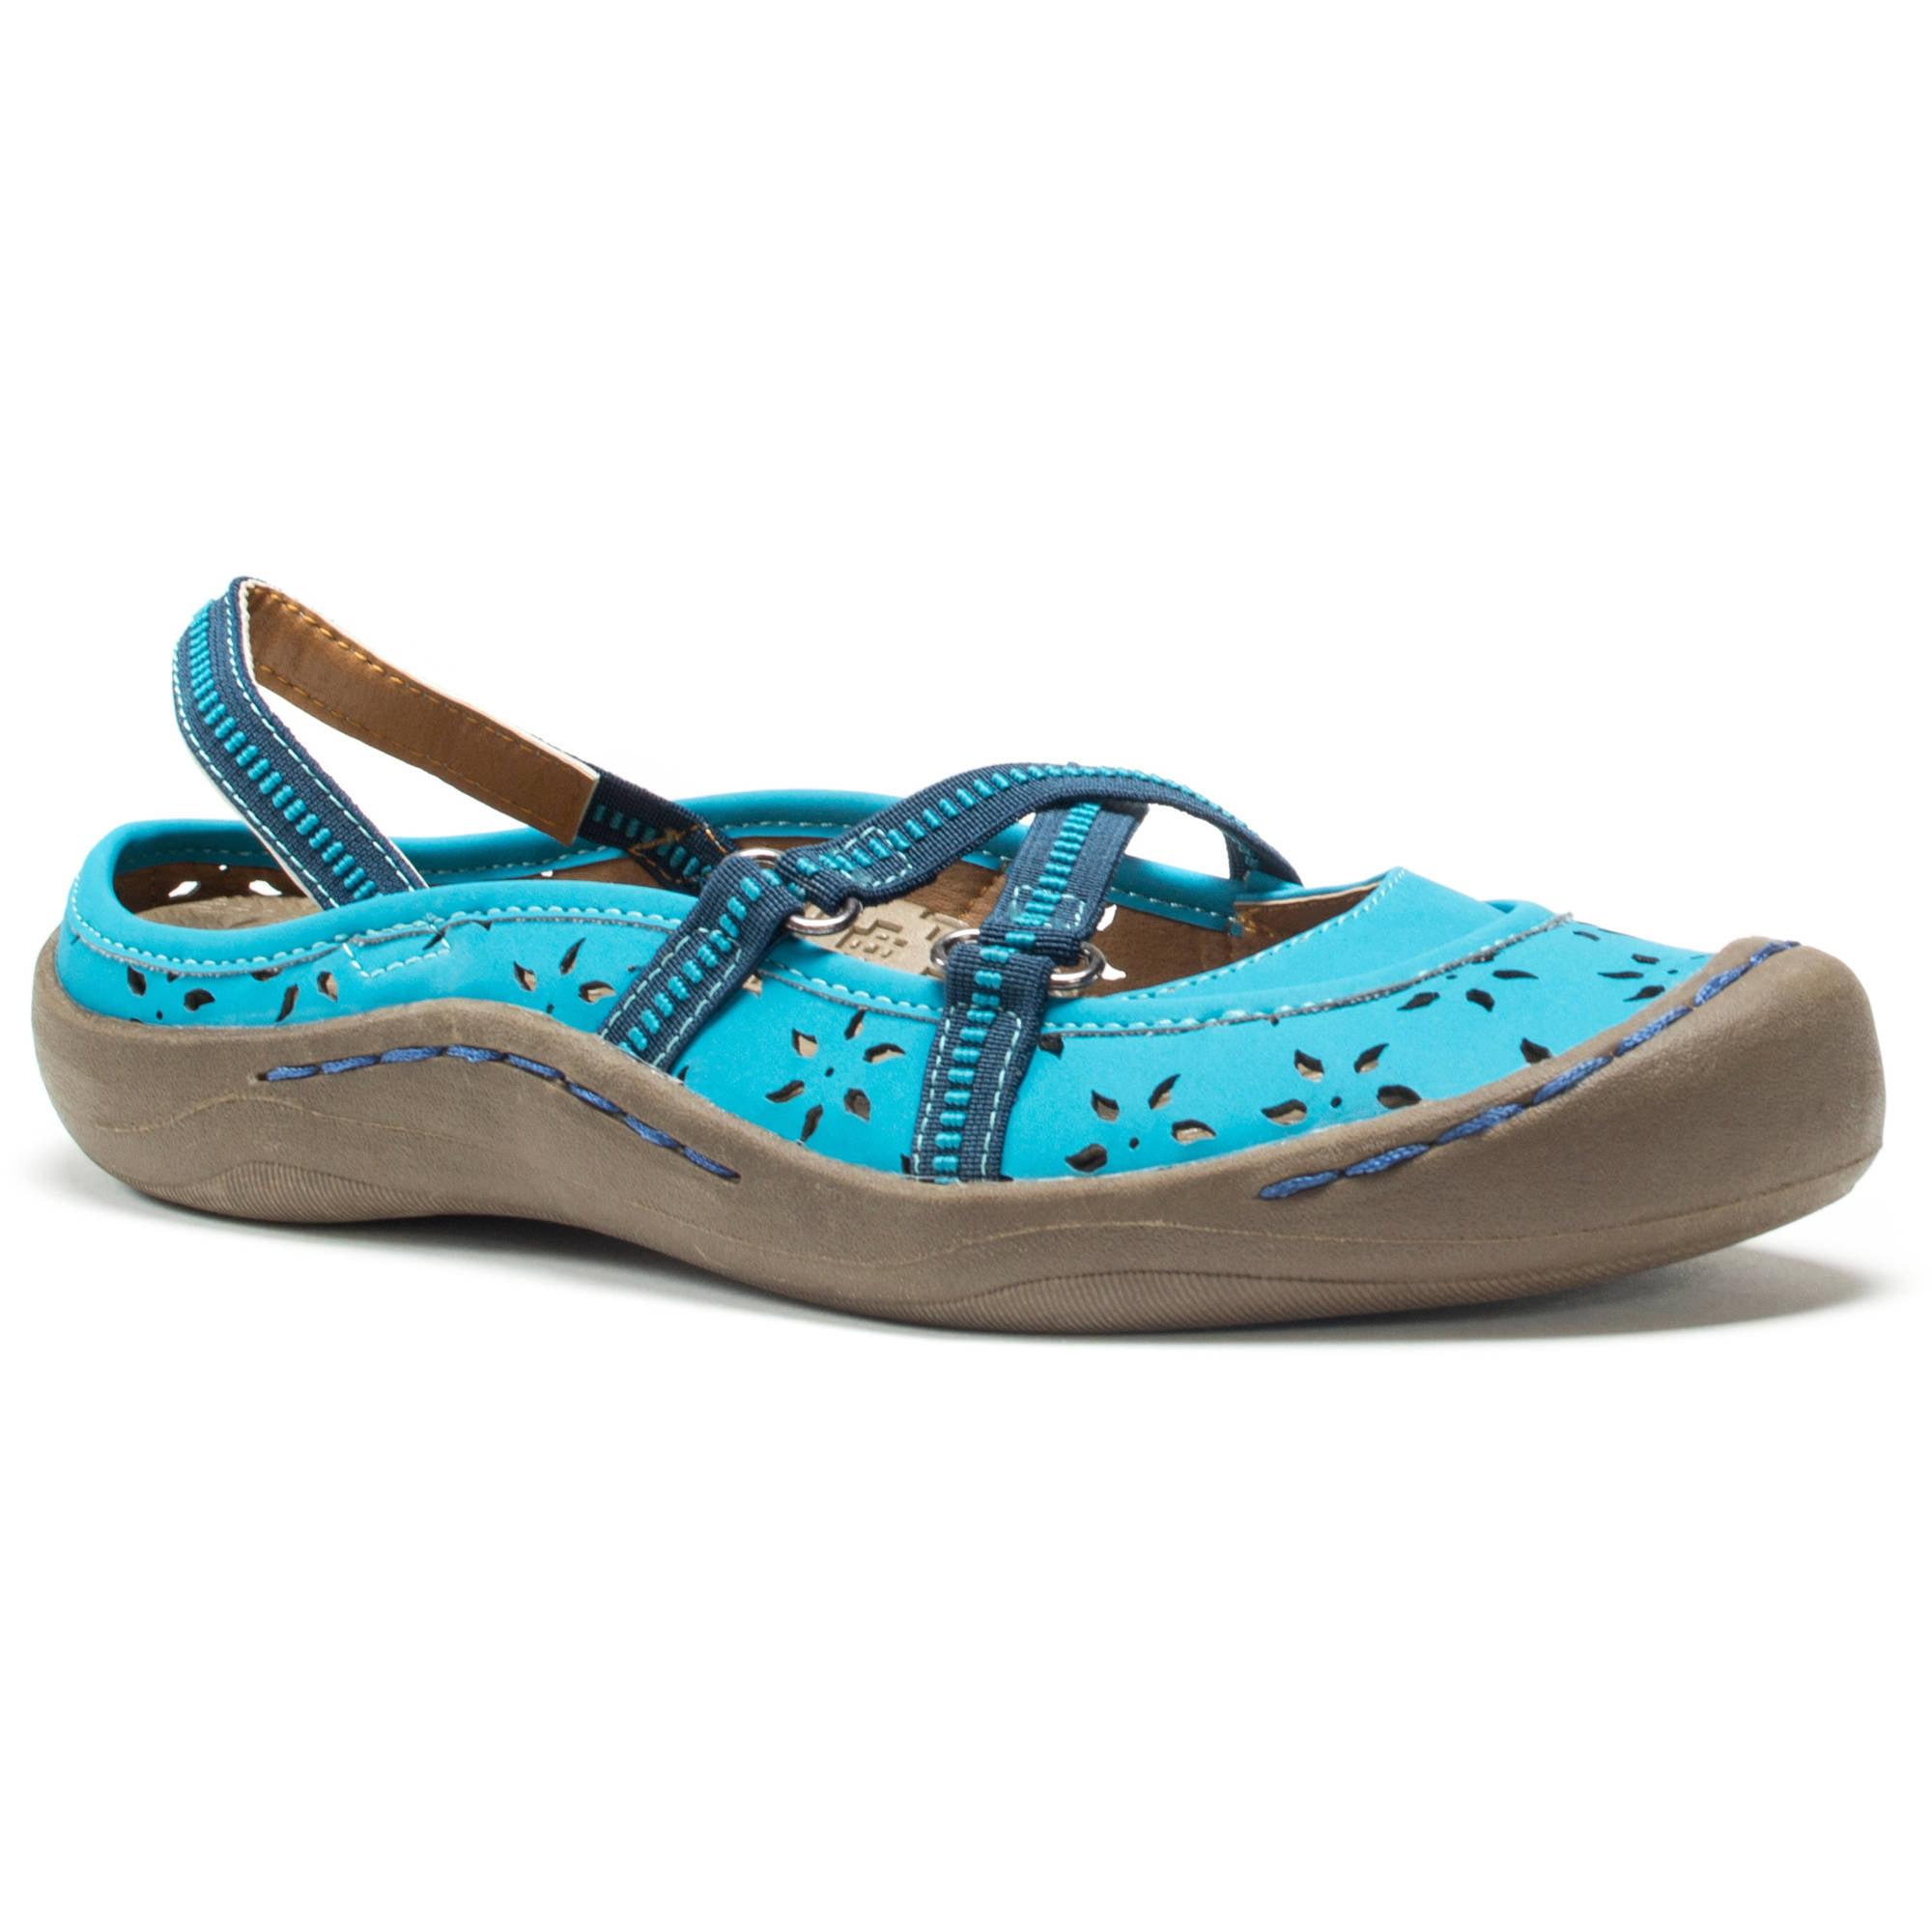 MUK LUKS - Women s Erin Strap Shoes - Walmart.com 66e30717b68e